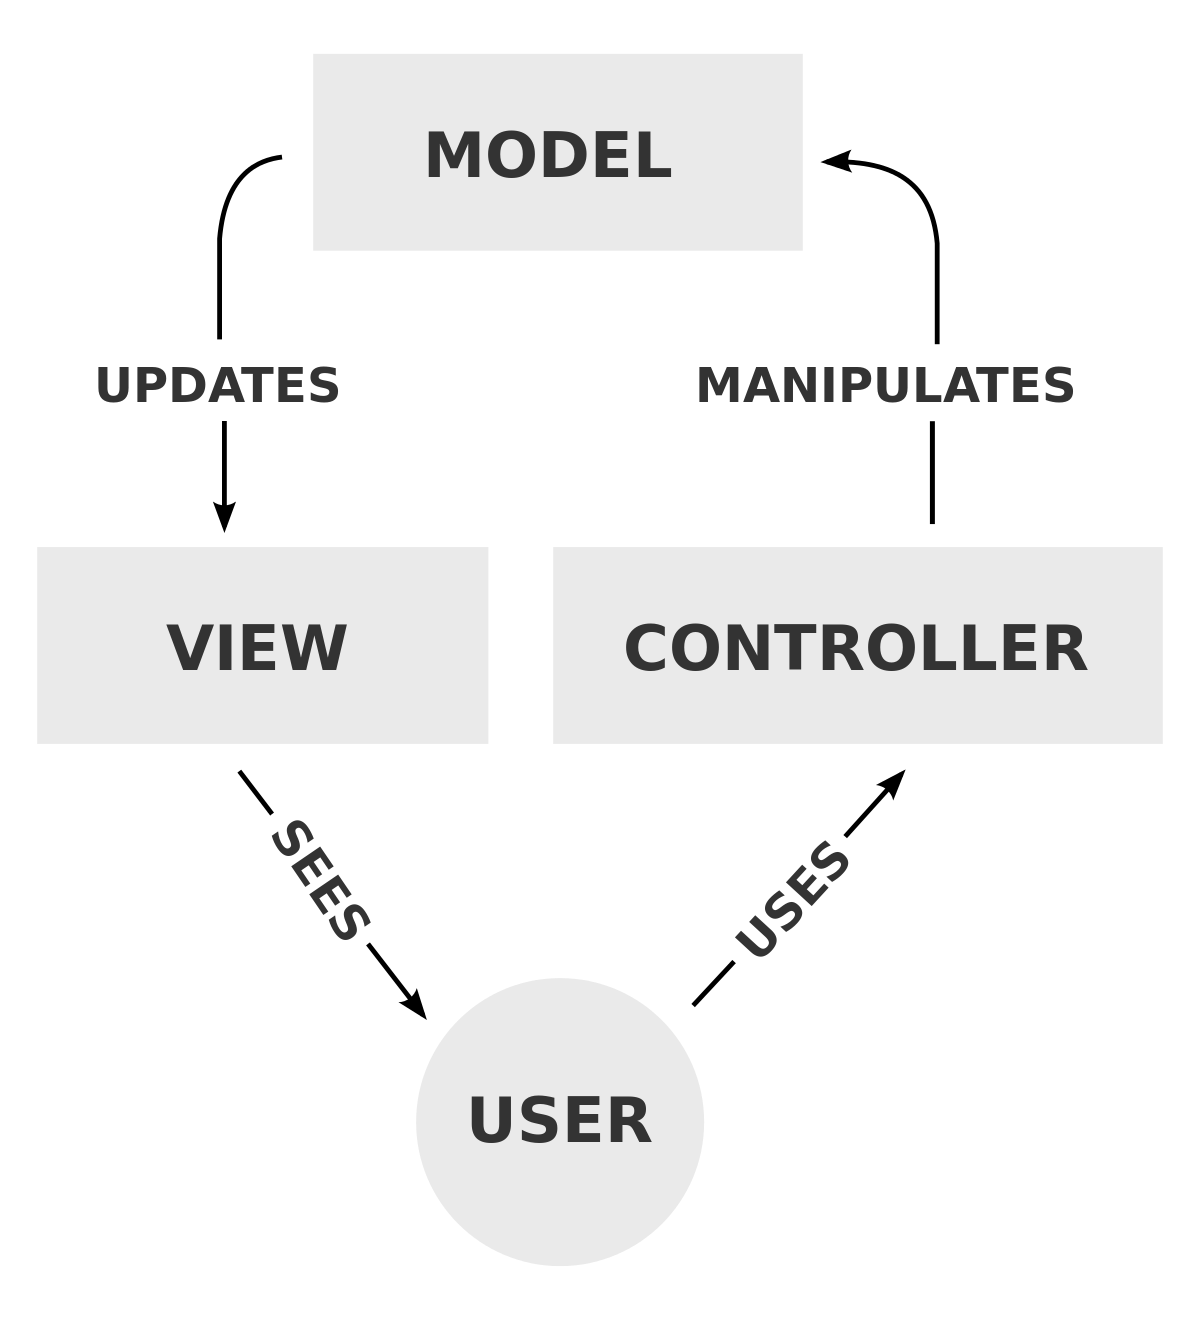 A diagram describing MVC architecture